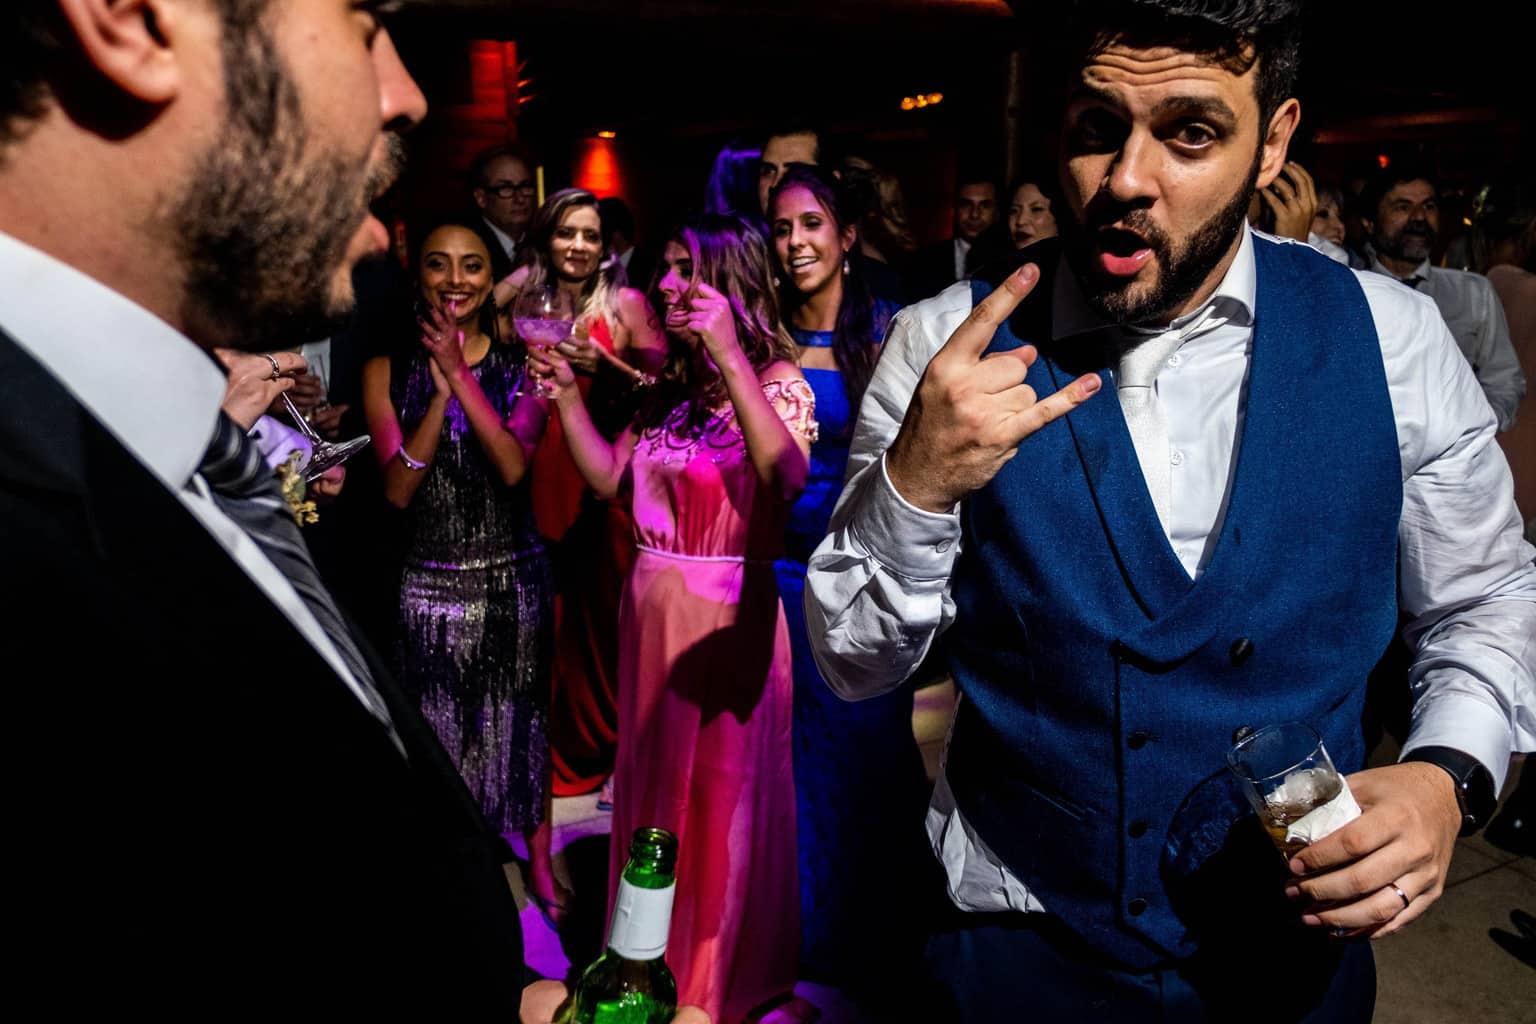 Bel-Benkler-eventos-Casamento-Ariane-e-Matheus-cerimonia-decoracao-contemporanea-fotografia-Rafael-Bigarelli-noivos-na-pista-Spazio-Giardini-32